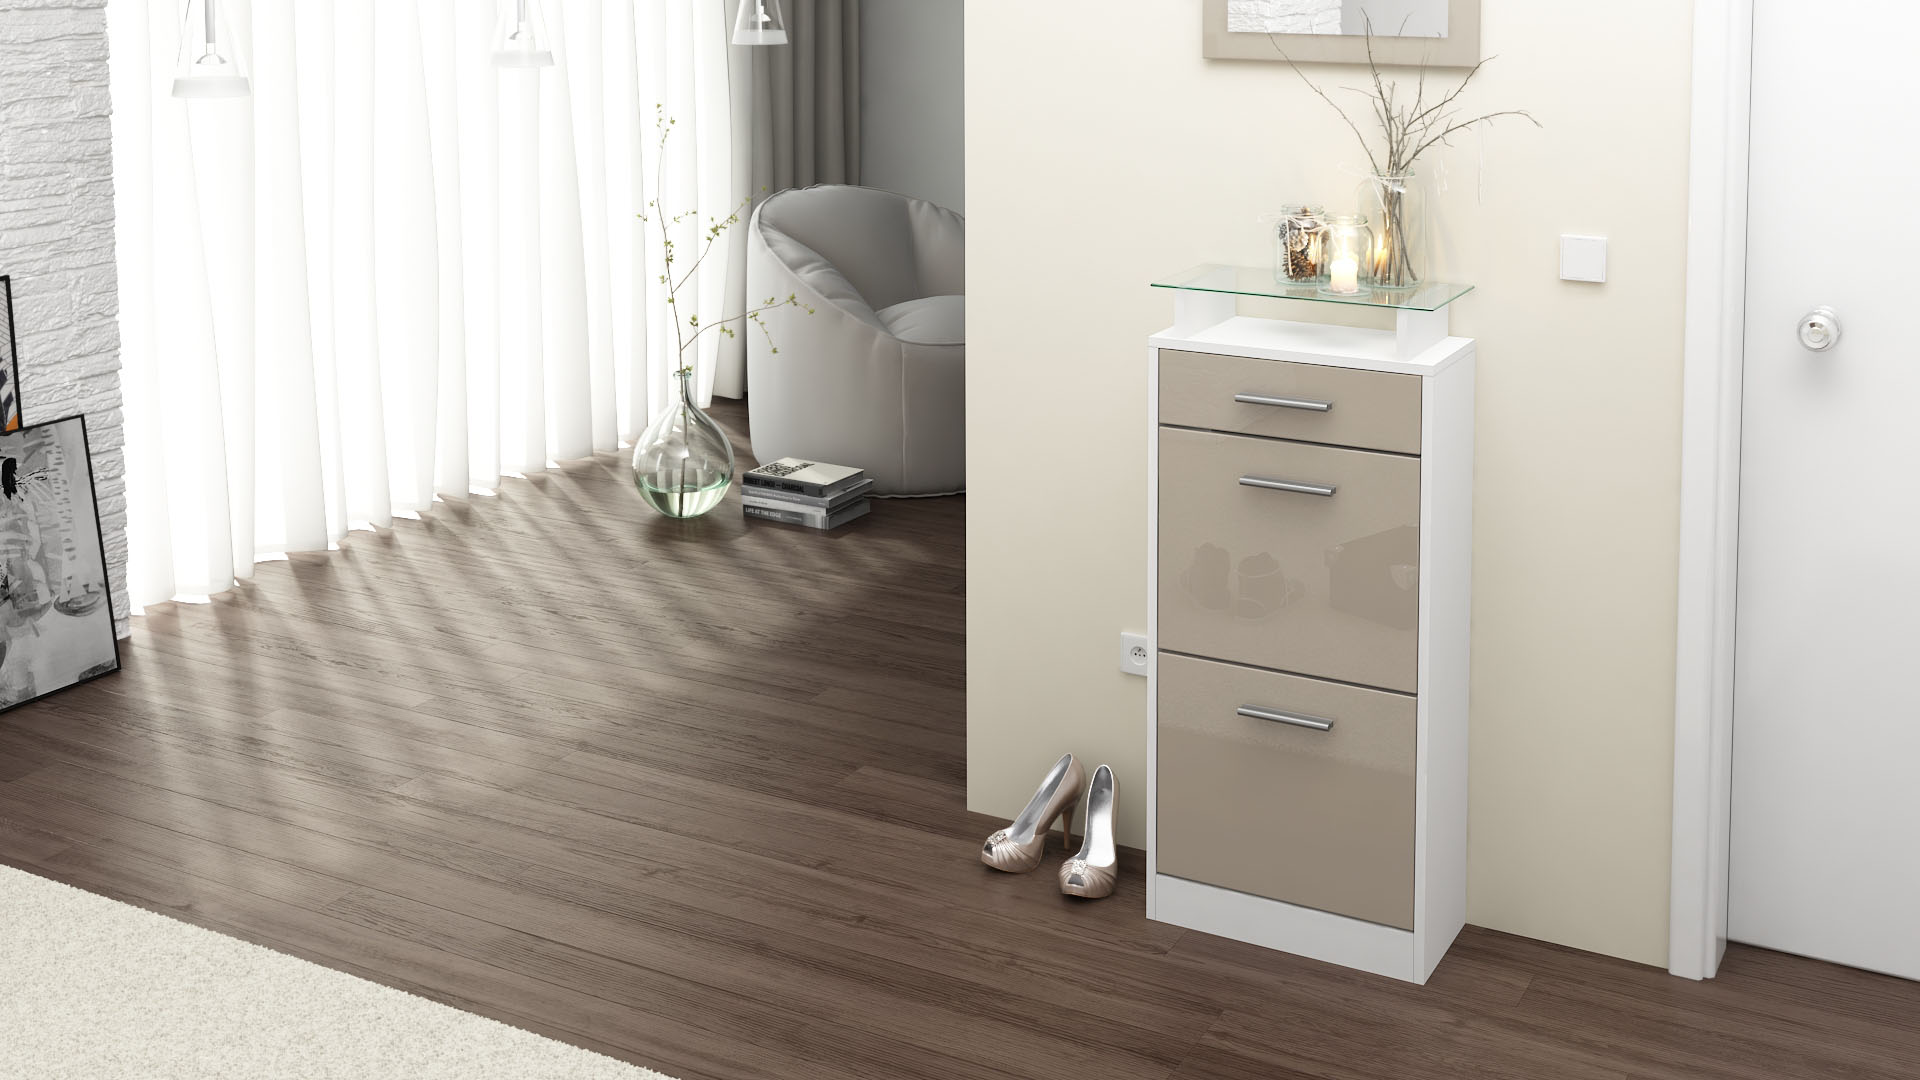 schuhschrank schuhkipper schuh regal loret v2 wei. Black Bedroom Furniture Sets. Home Design Ideas